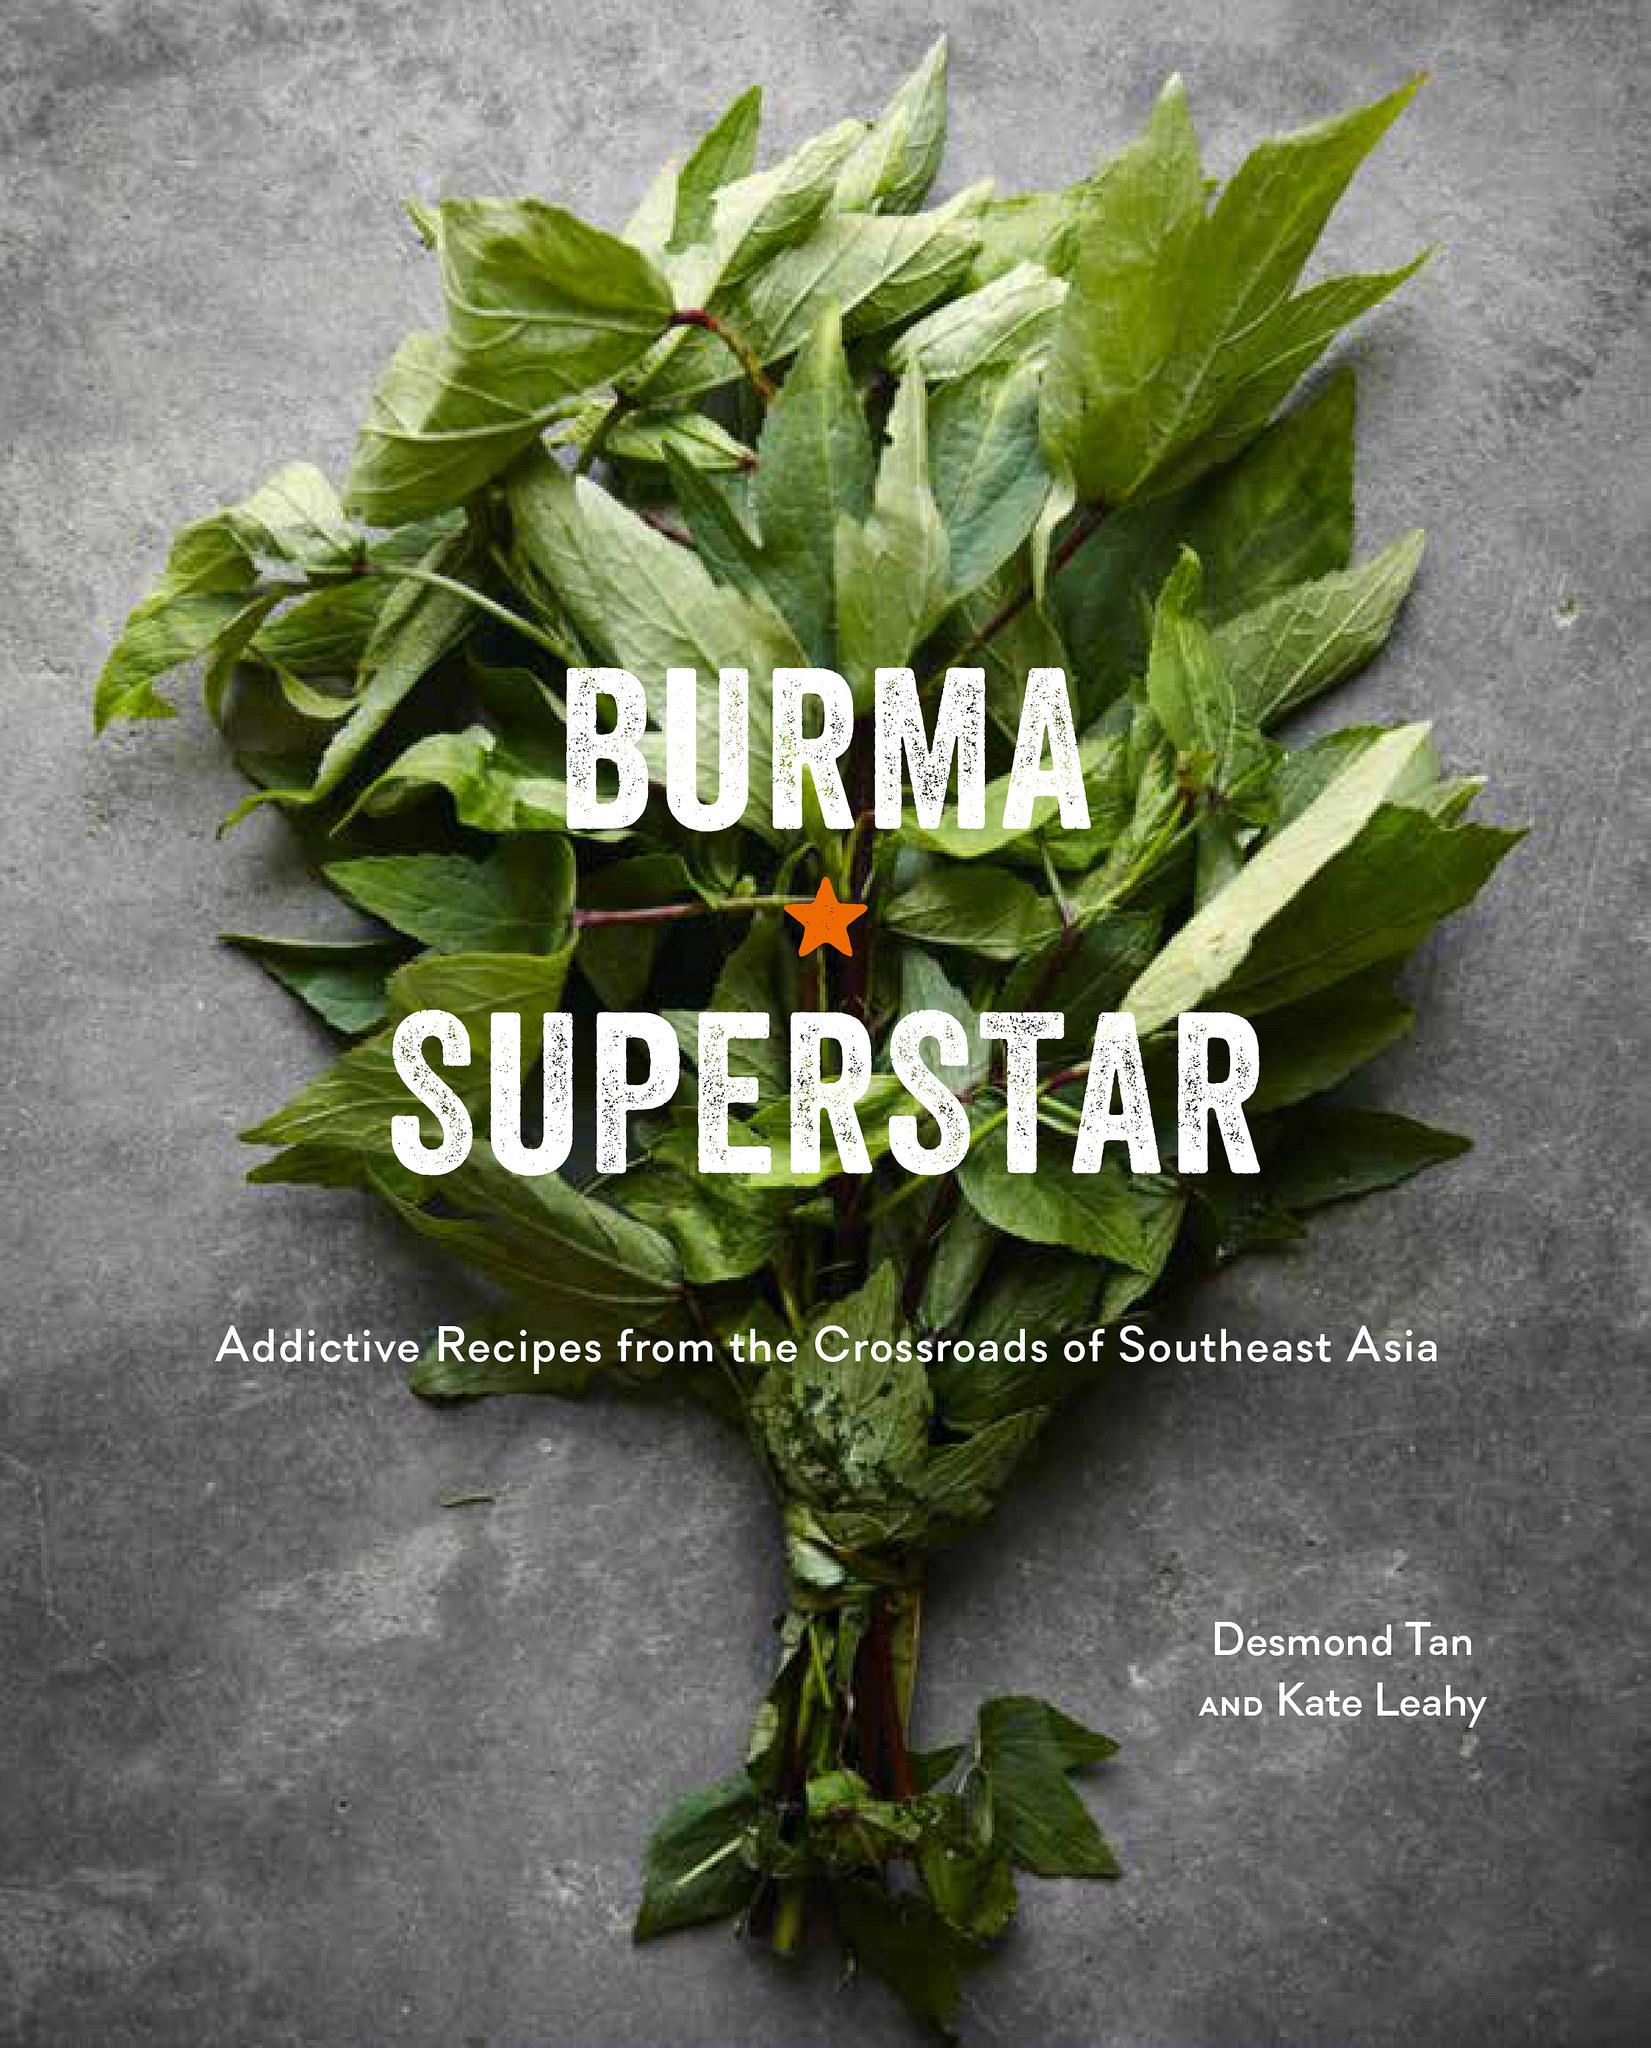 Burma Superstar Cookbook